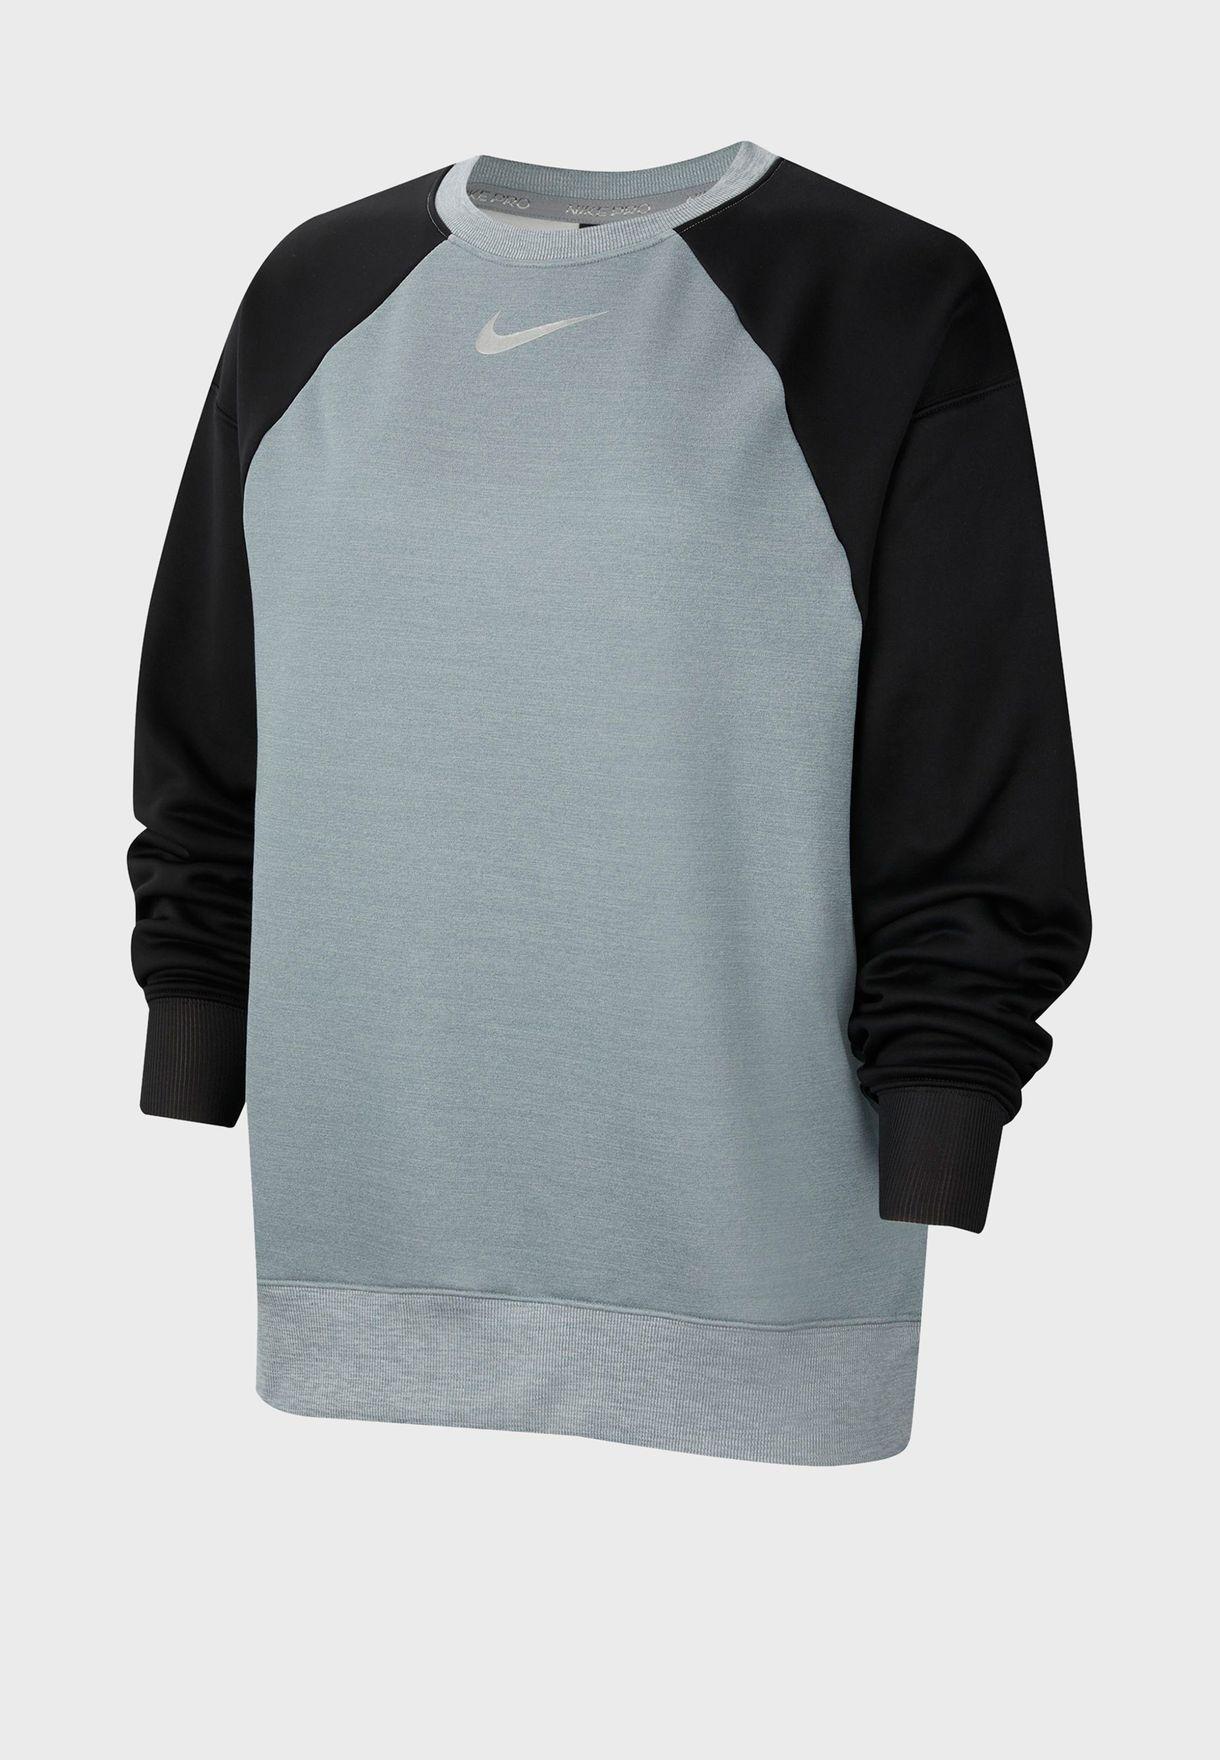 Therma Colour Block Sweatshirt